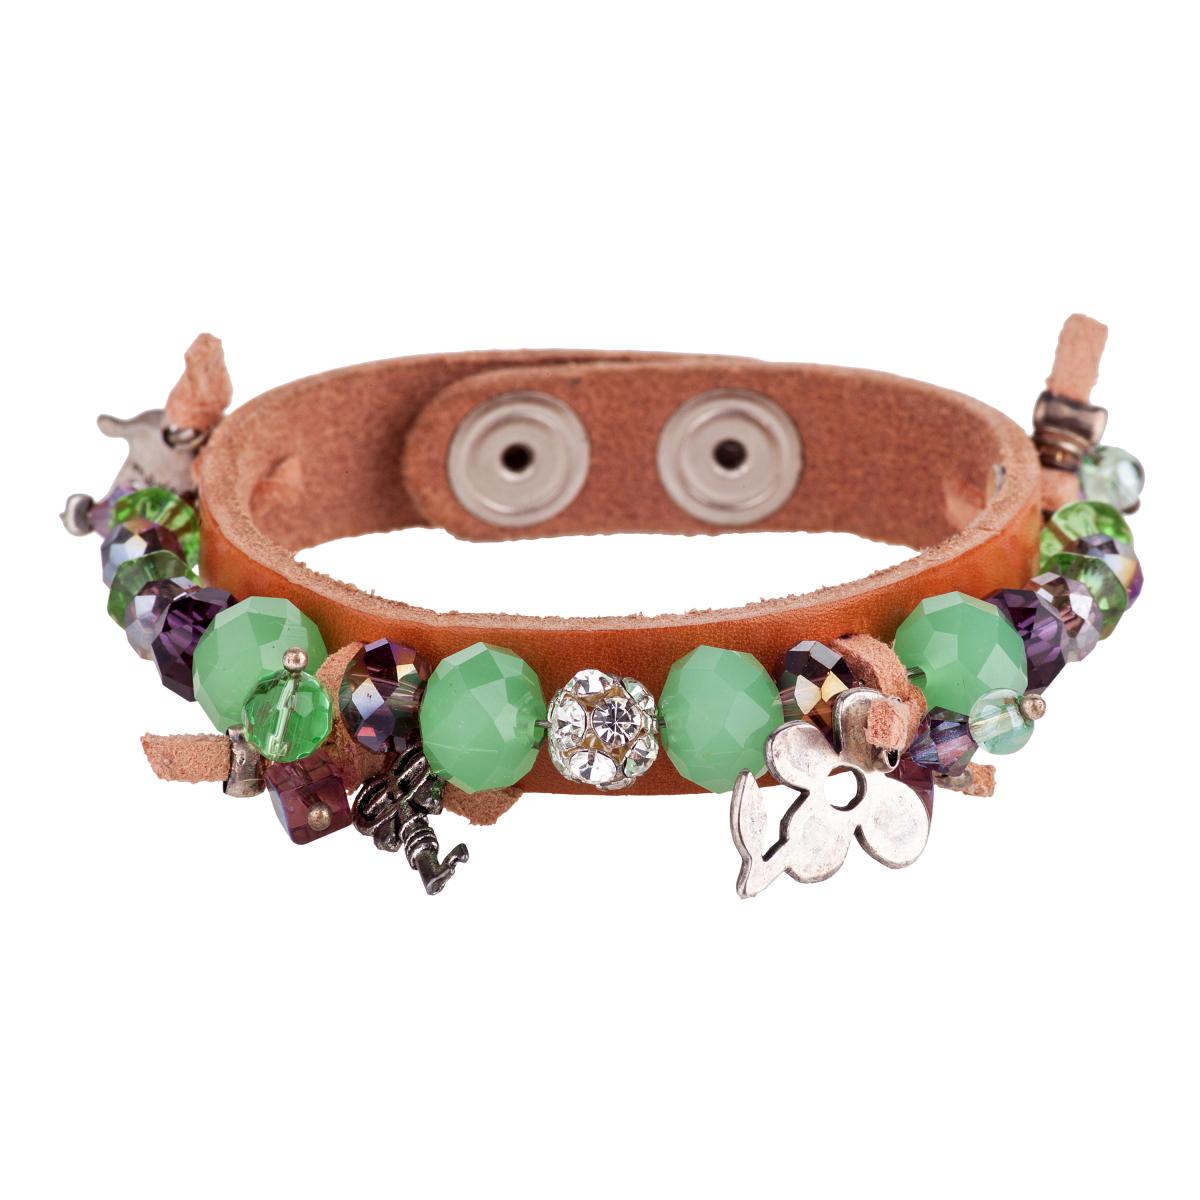 IRIS: Minty shades leather bracelet | Accessories,Jewelry > Bracelets,Jewelry -  Hiphunters Shop